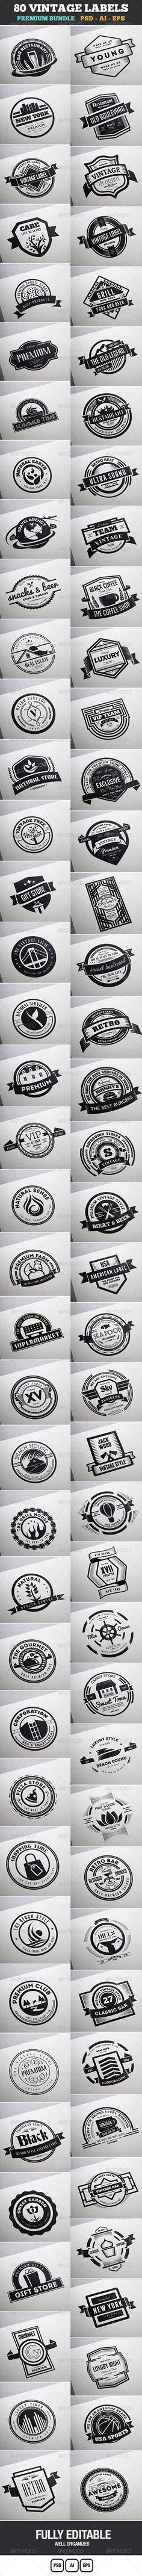 80 Vintage Labels & Badges Logos Bundle Template | Buy and Download: http://graphicriver.net/item/80-vintage-labels-badges-logos-bundle/7553006?WT.ac=category_thumb&WT.z_author=designdistrictmx&ref=ksioks